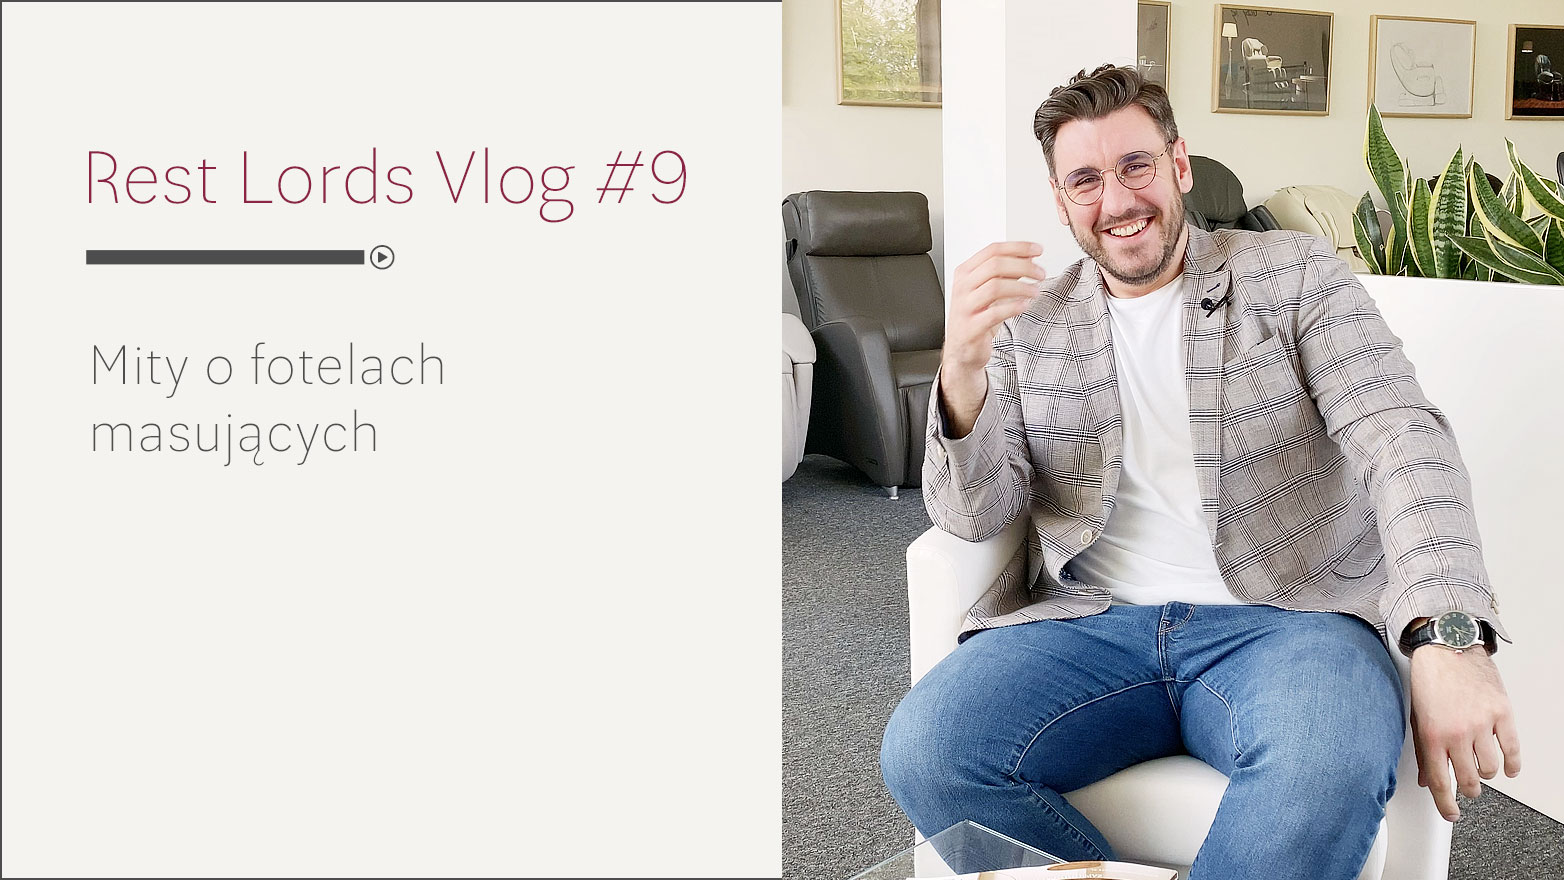 Vlog 9 mity o fotelach masujących